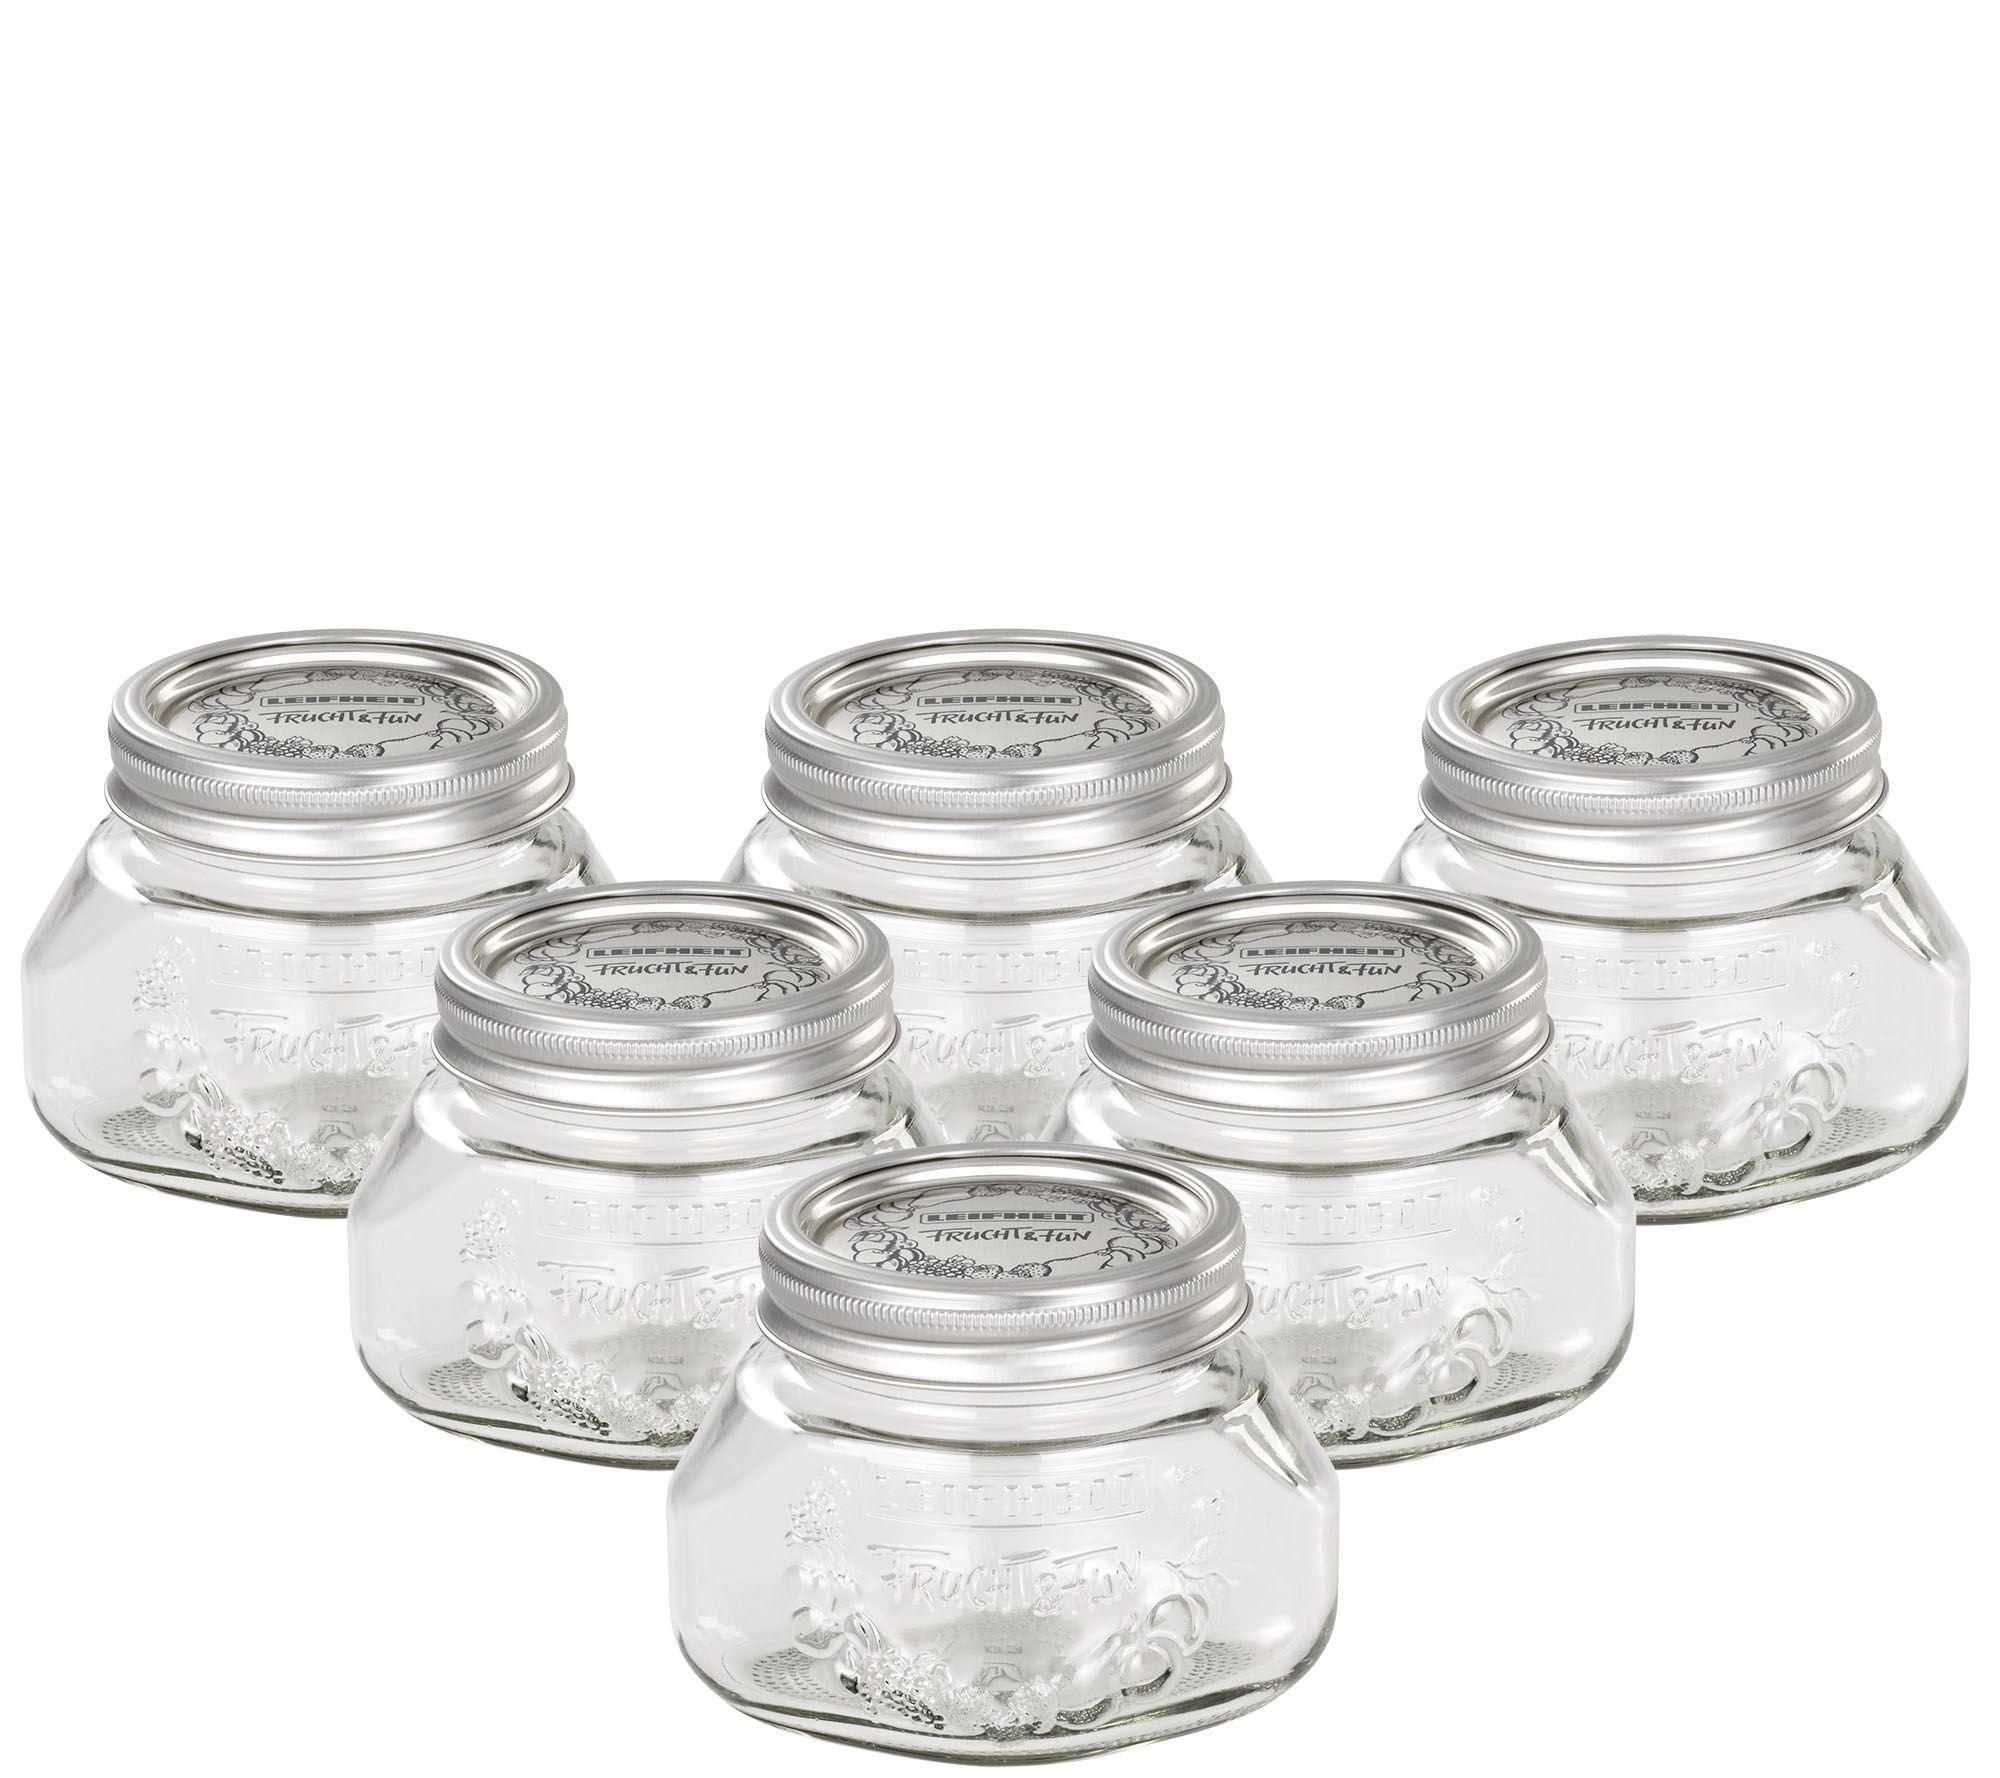 sc 1 st  QVC.com & Leifheit 17-oz Glass Wide-Mouth Mason Canning Jar - Page 1 u2014 QVC.com